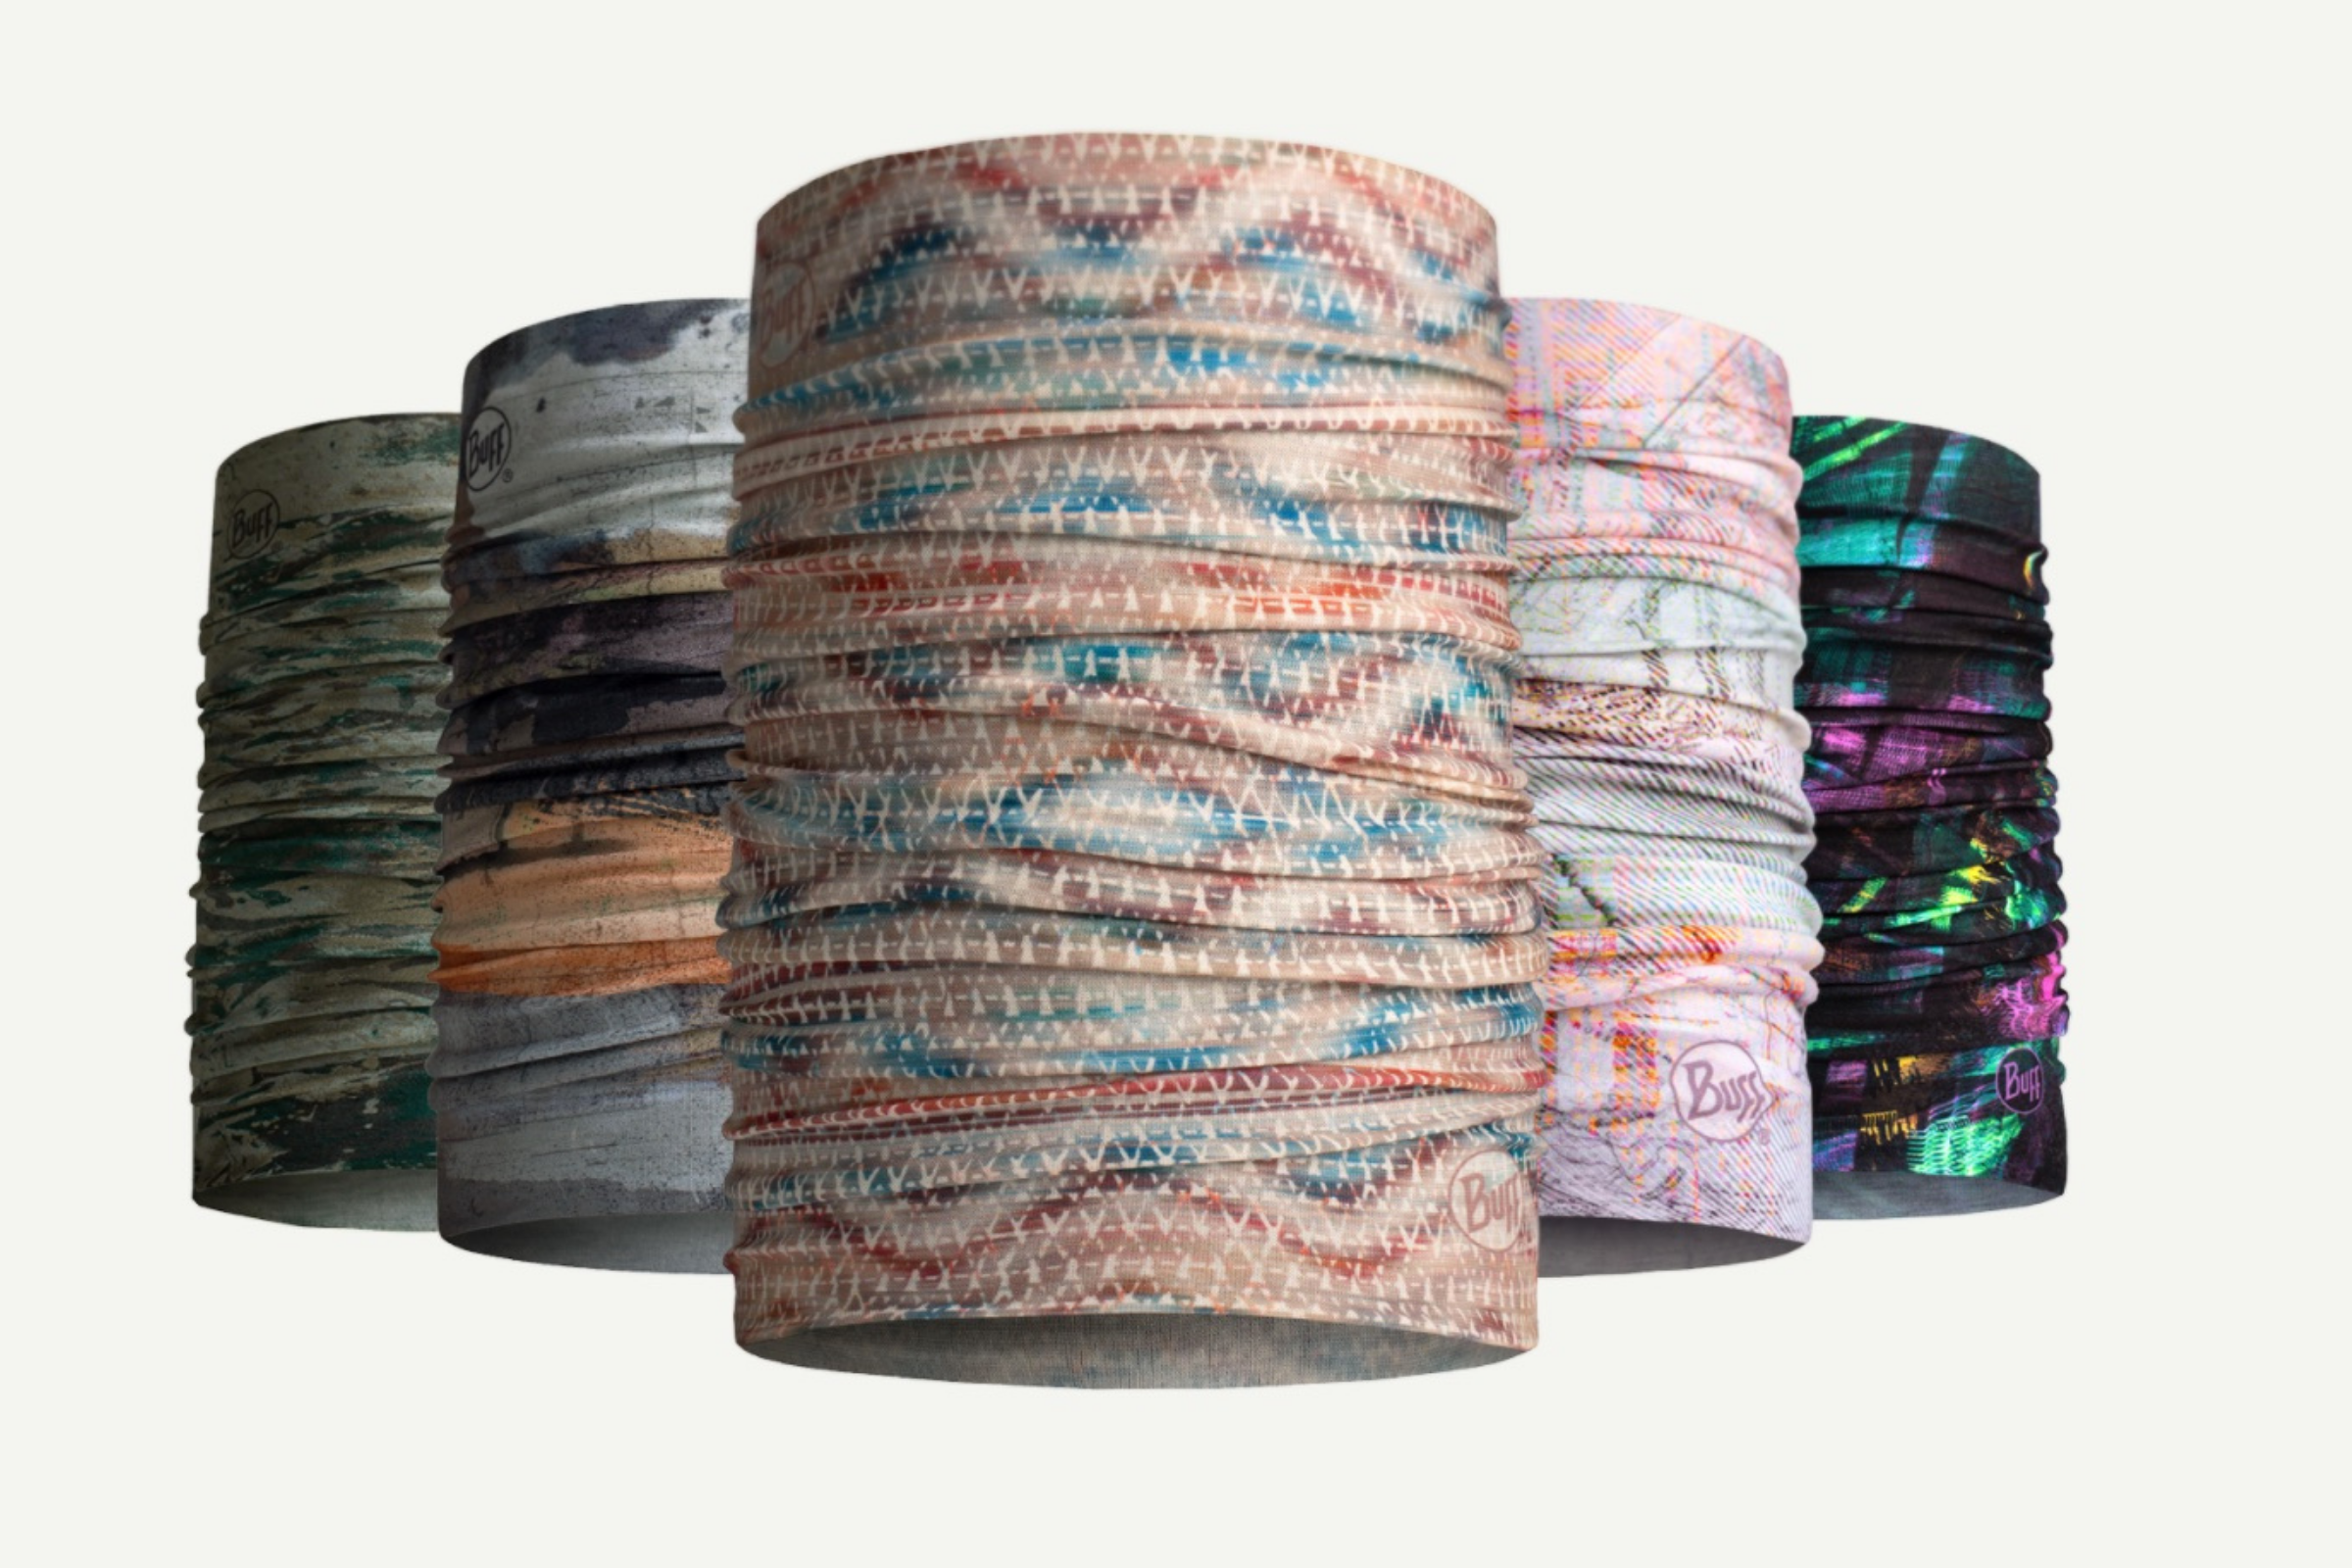 Buff makes eco-friendly neck tube called the Original Ecostretch